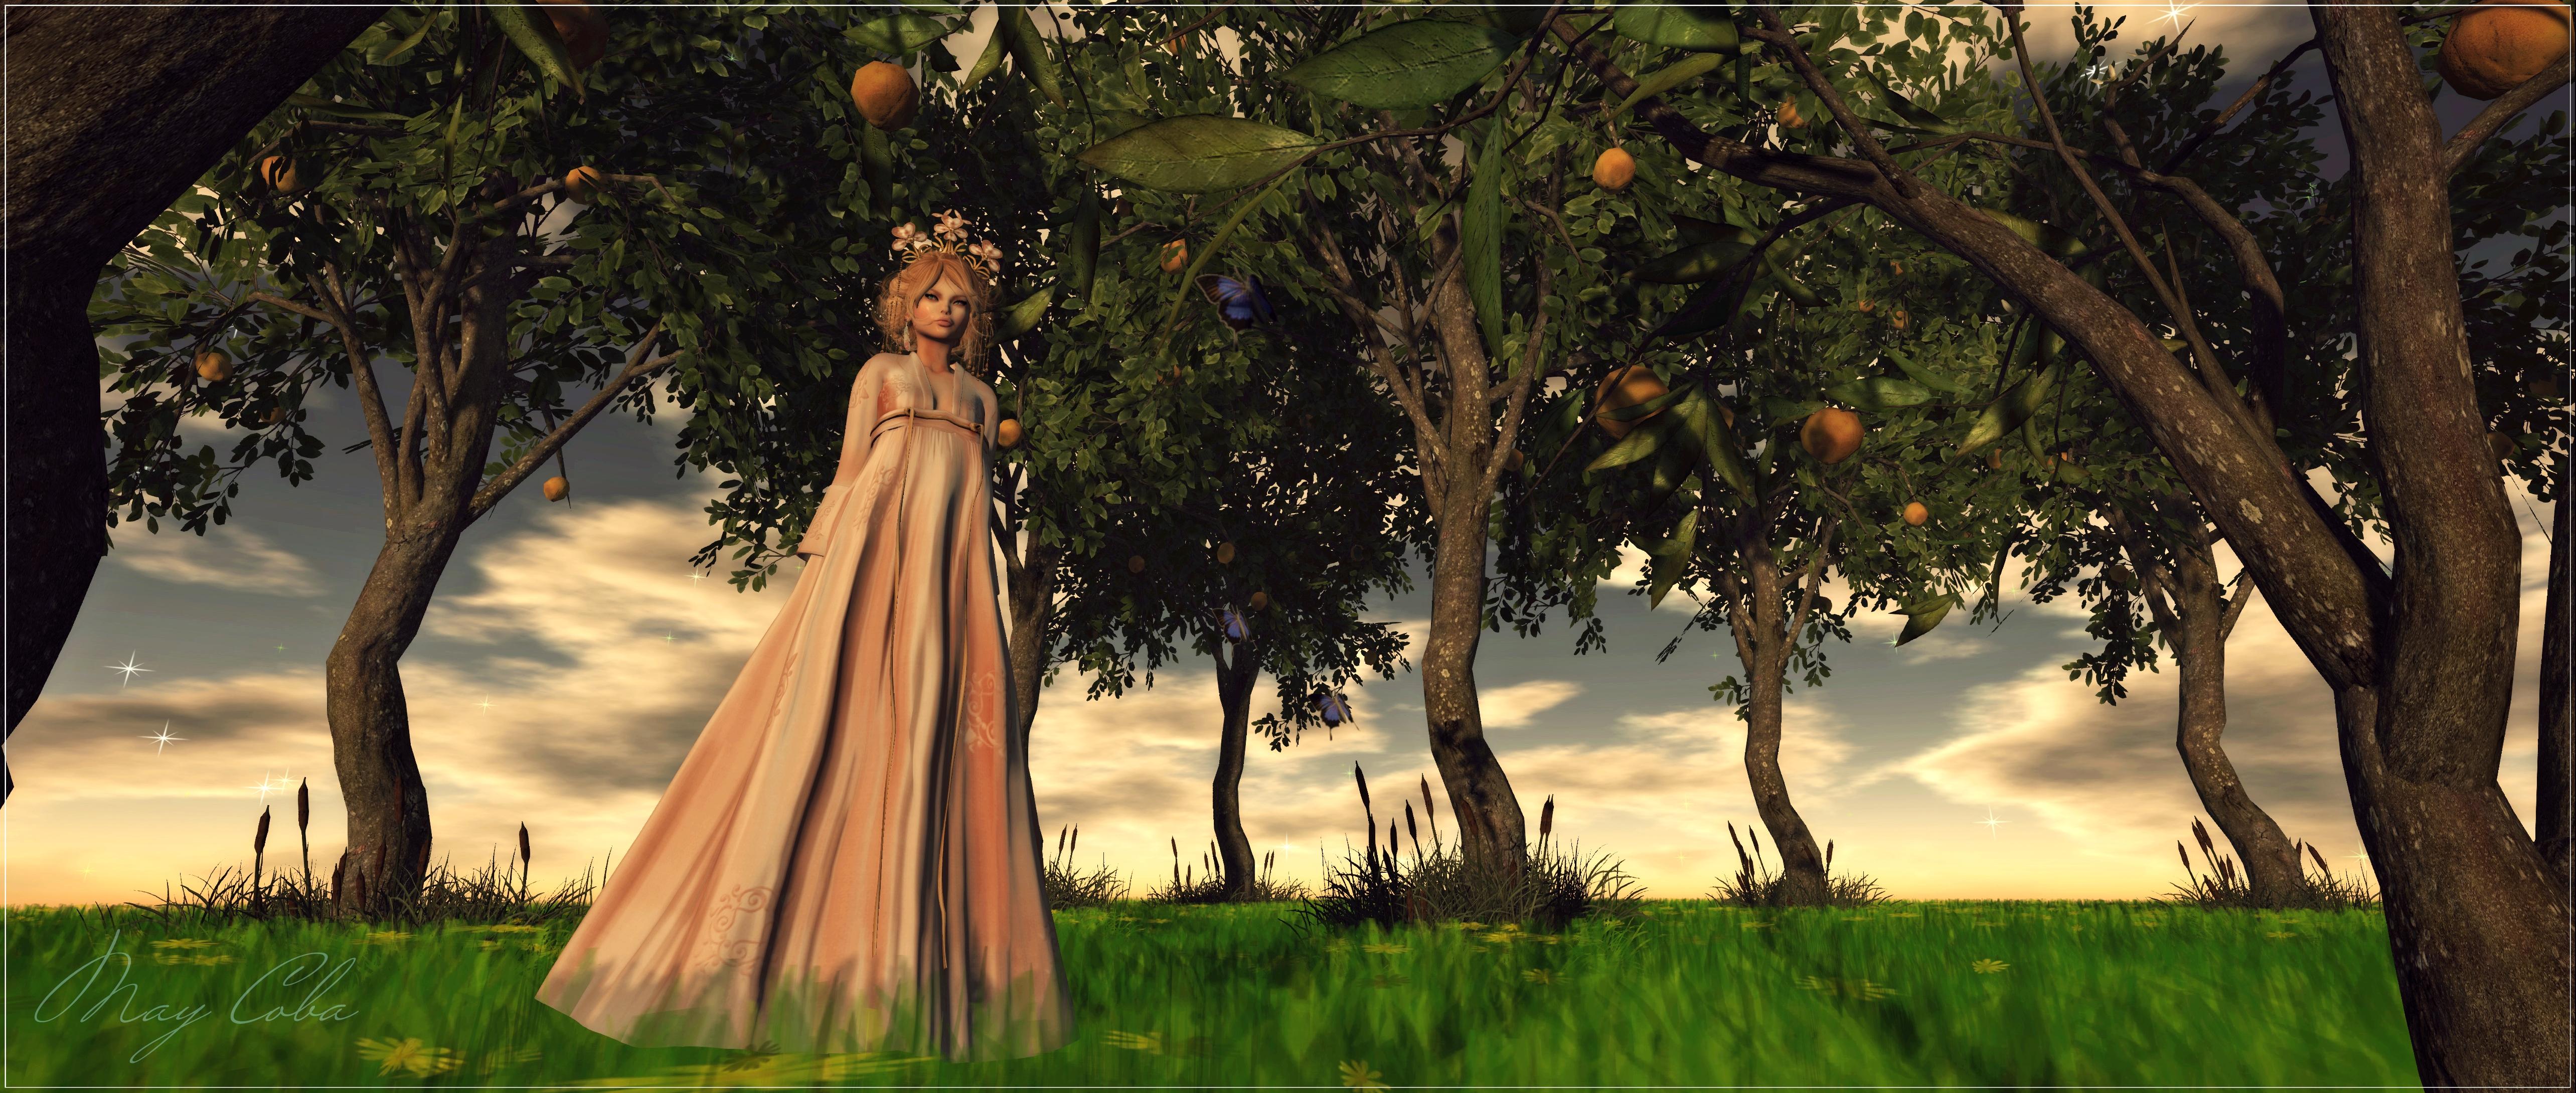 Un valle de naranjos